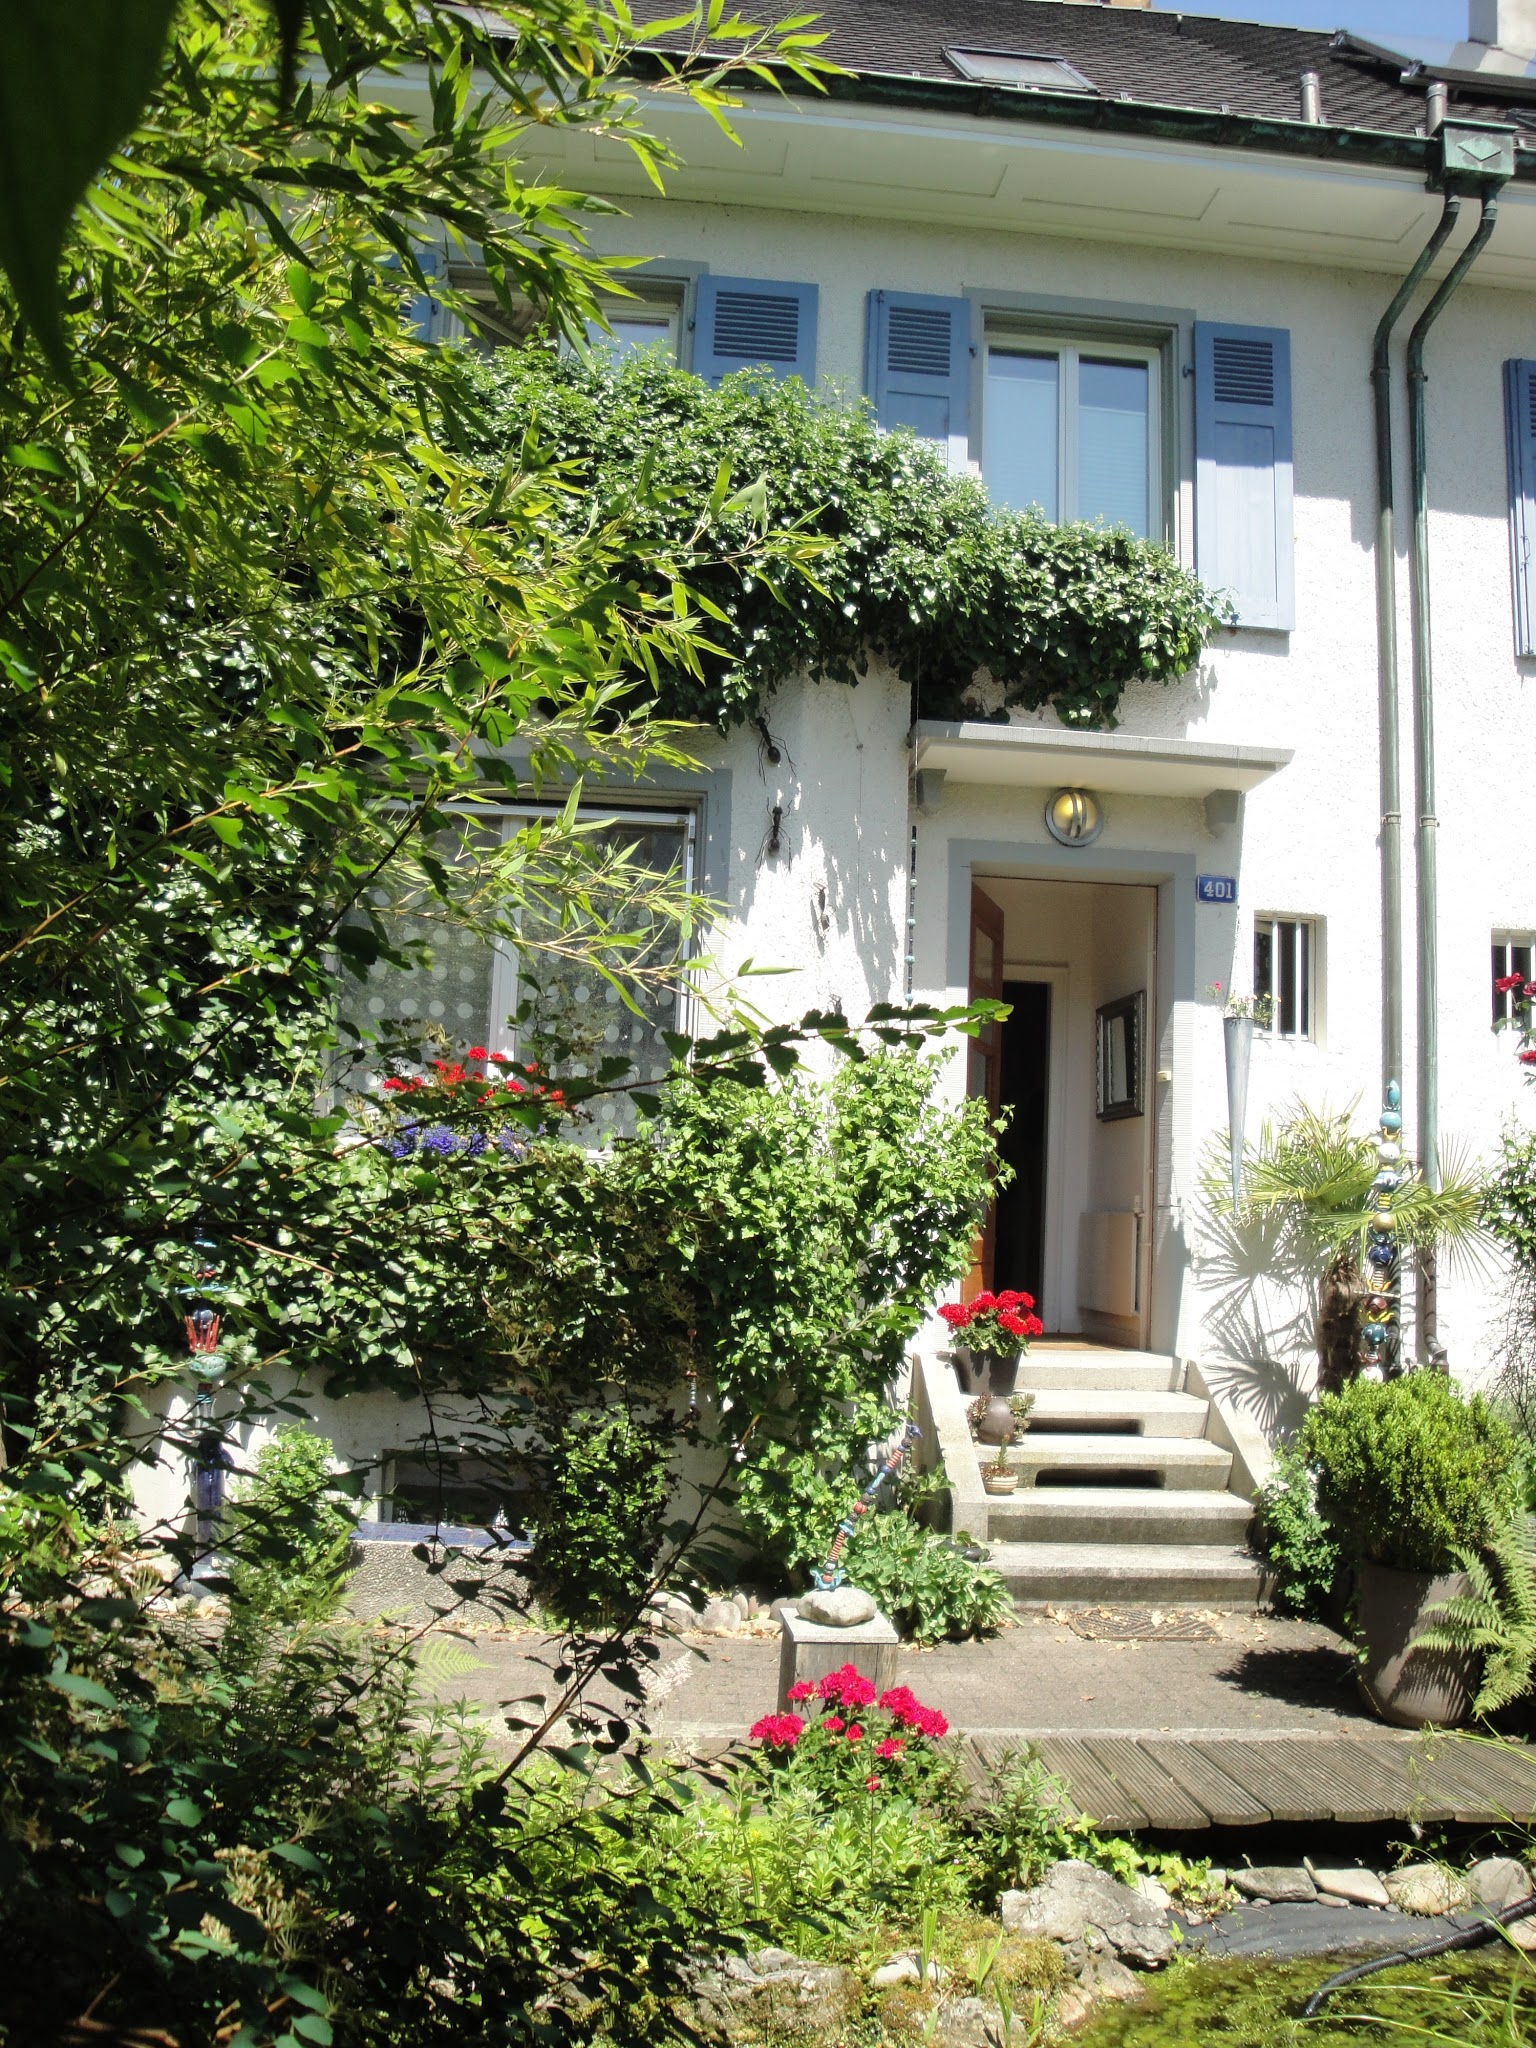 6,5-Zimmer-Doppel-EFH in Riehen / BS (verkauft)